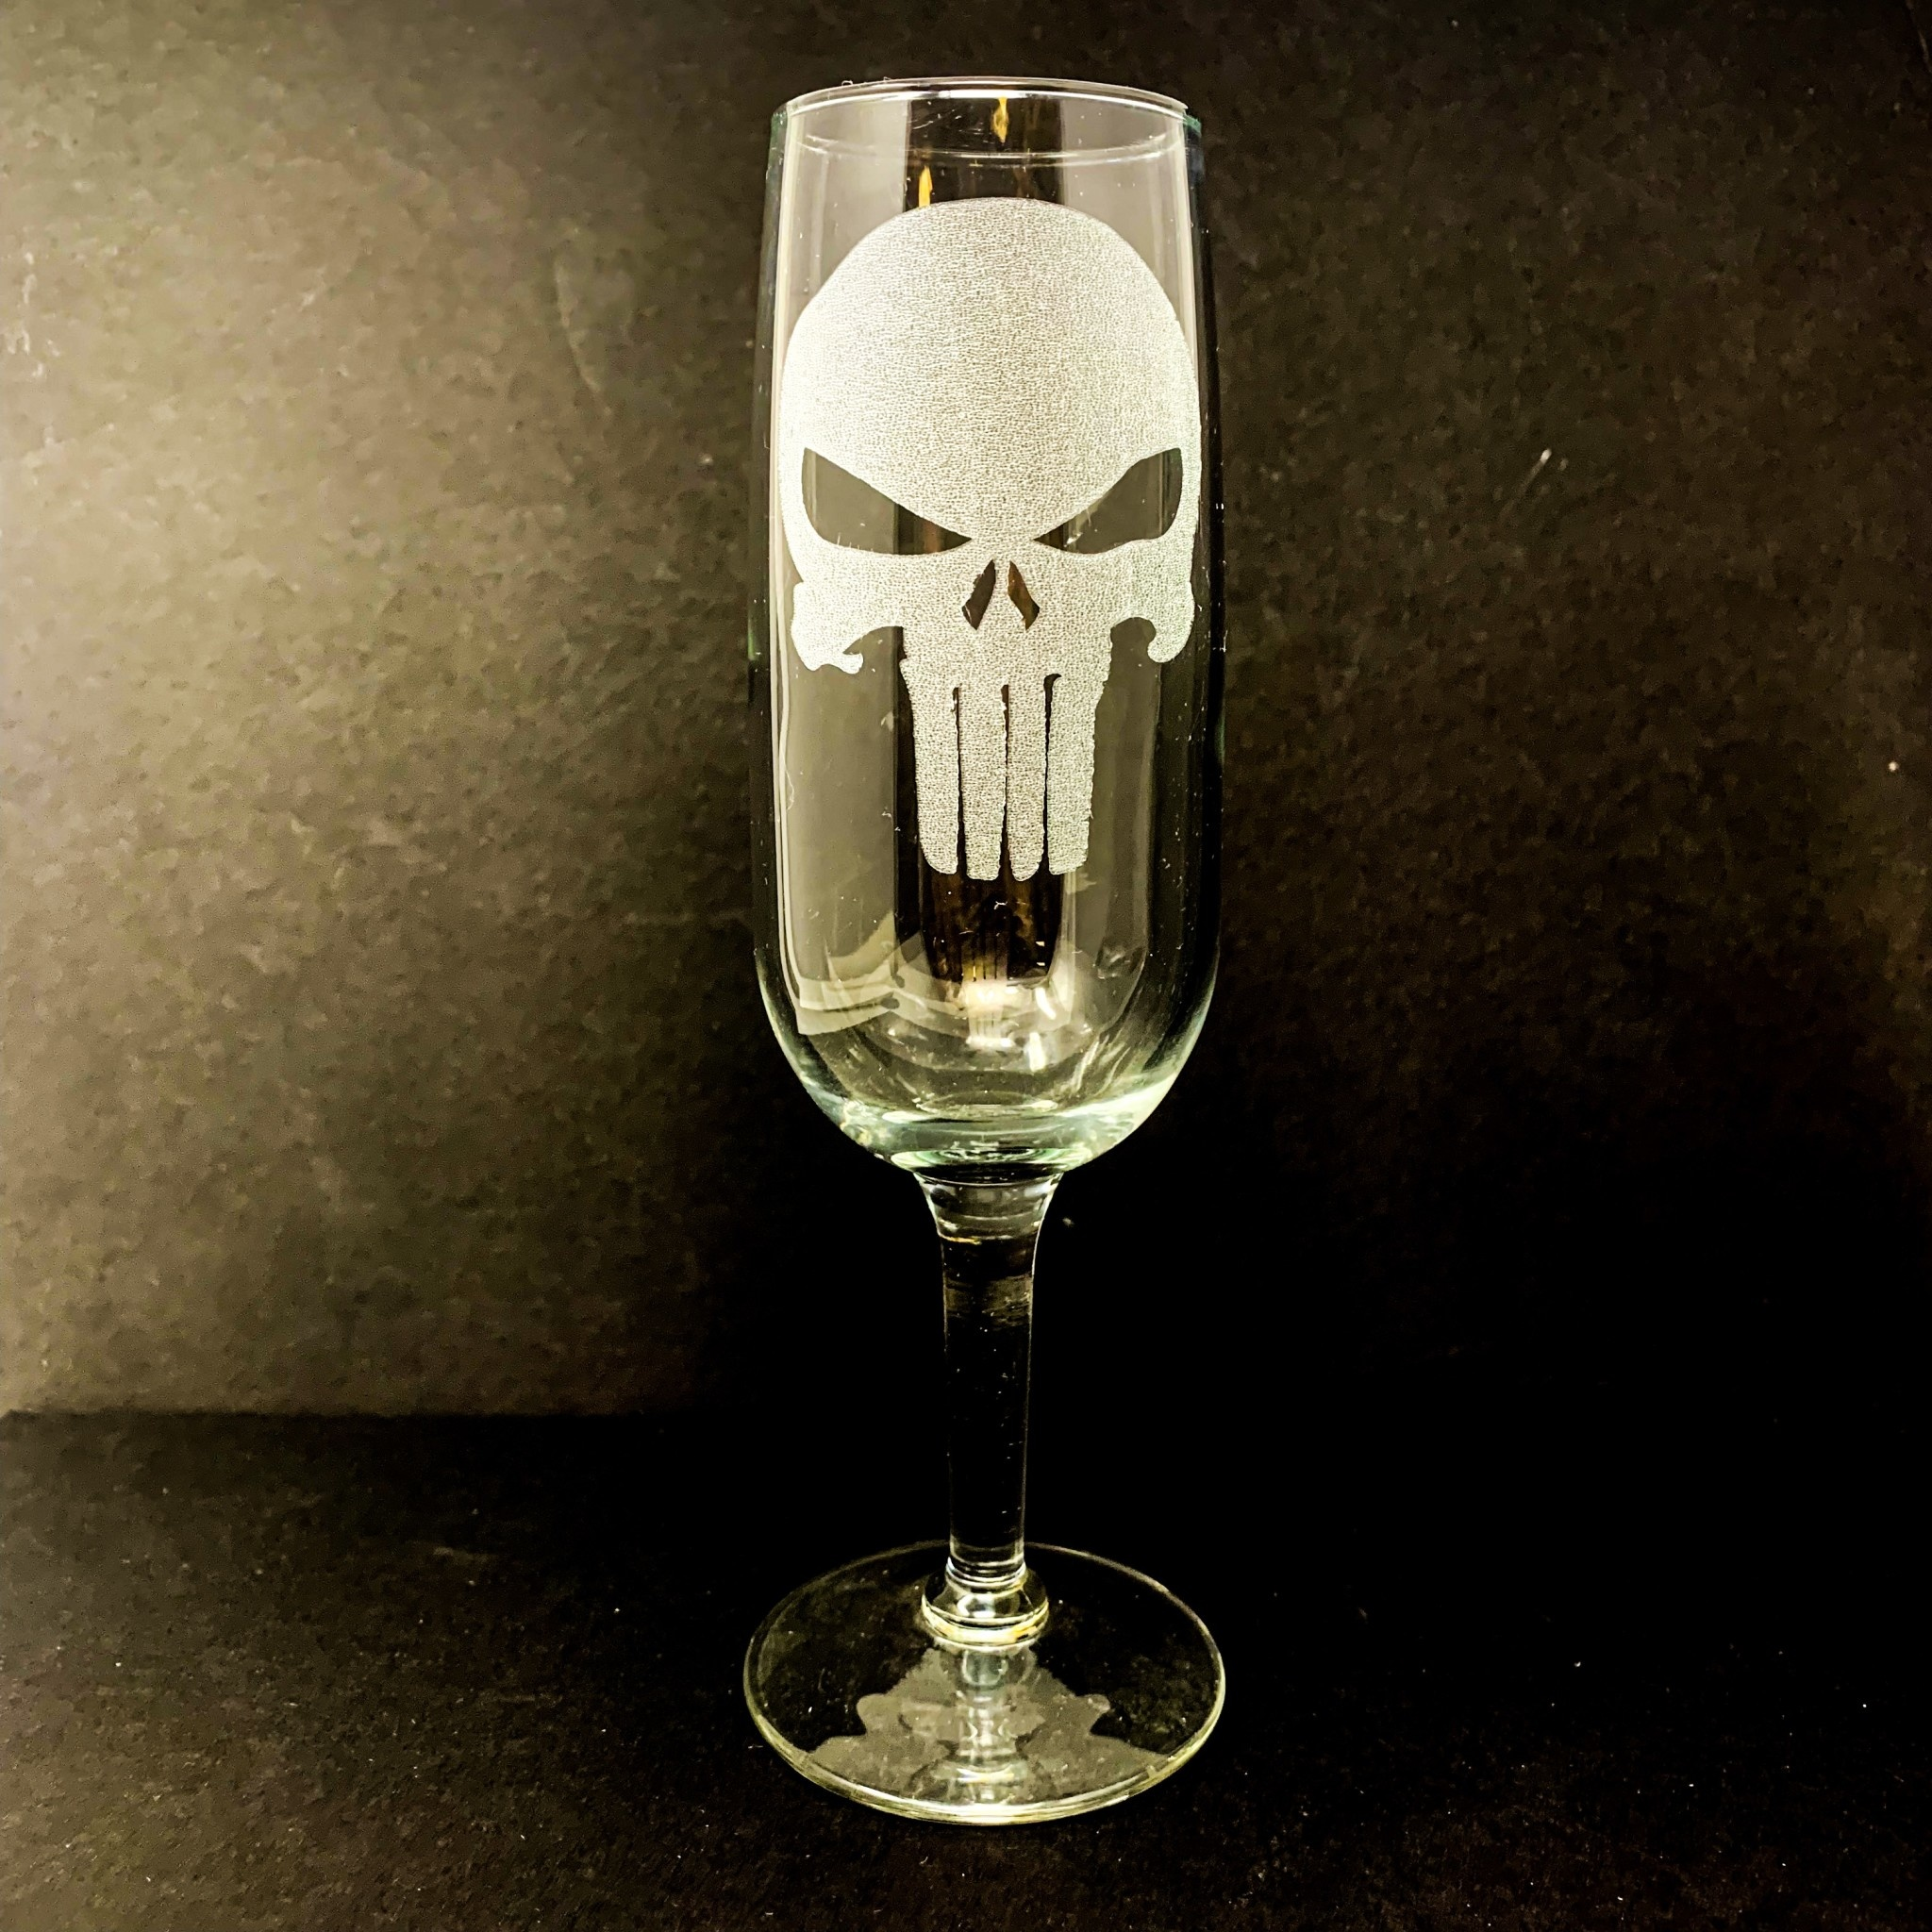 Sarasota Laser Engraving Engraved Punisher Toasting Flutes